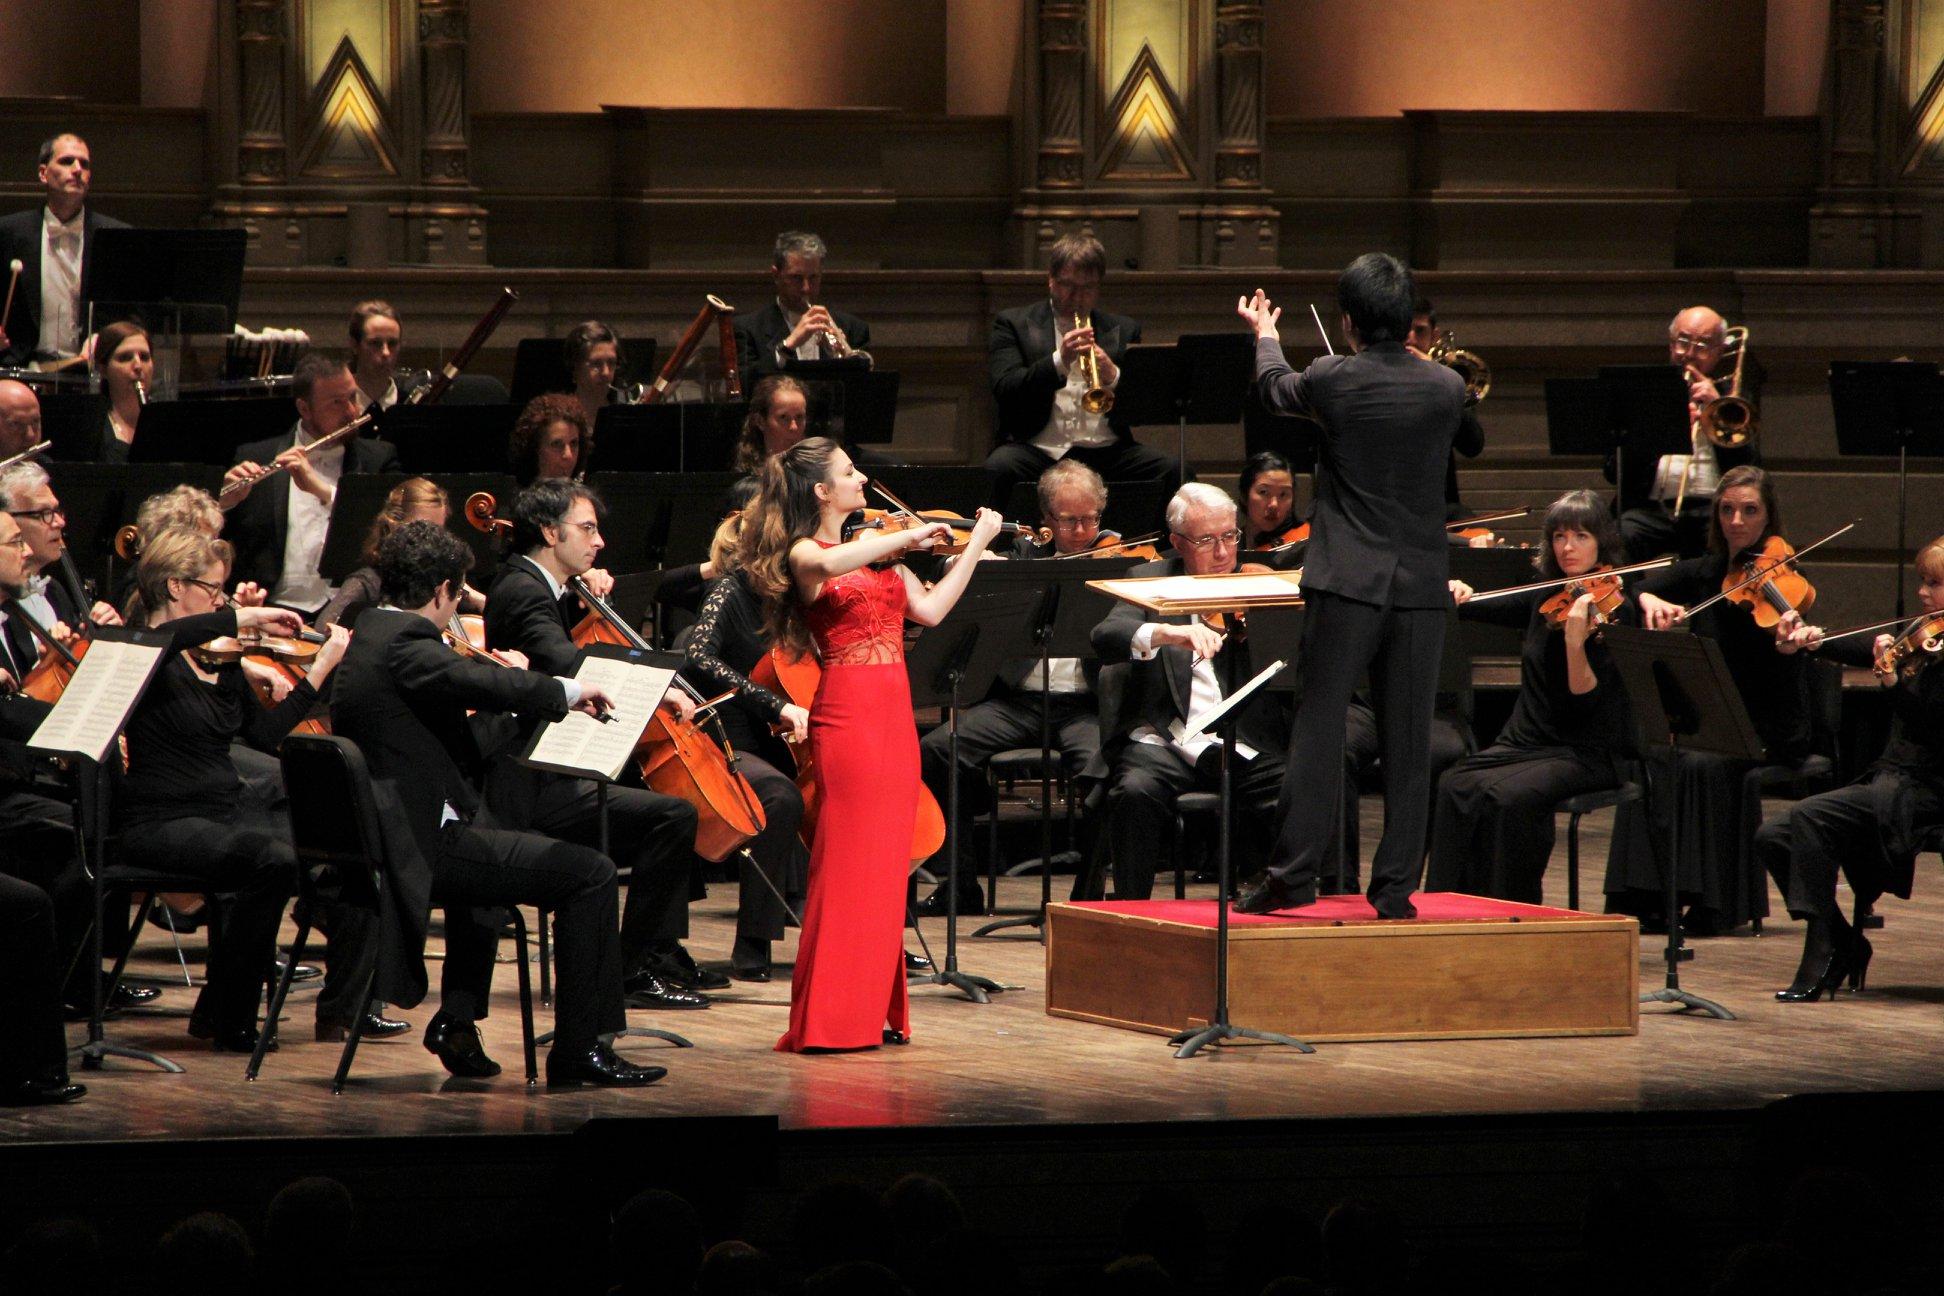 Photo courtesy of Vancouver Symphony Orchestra